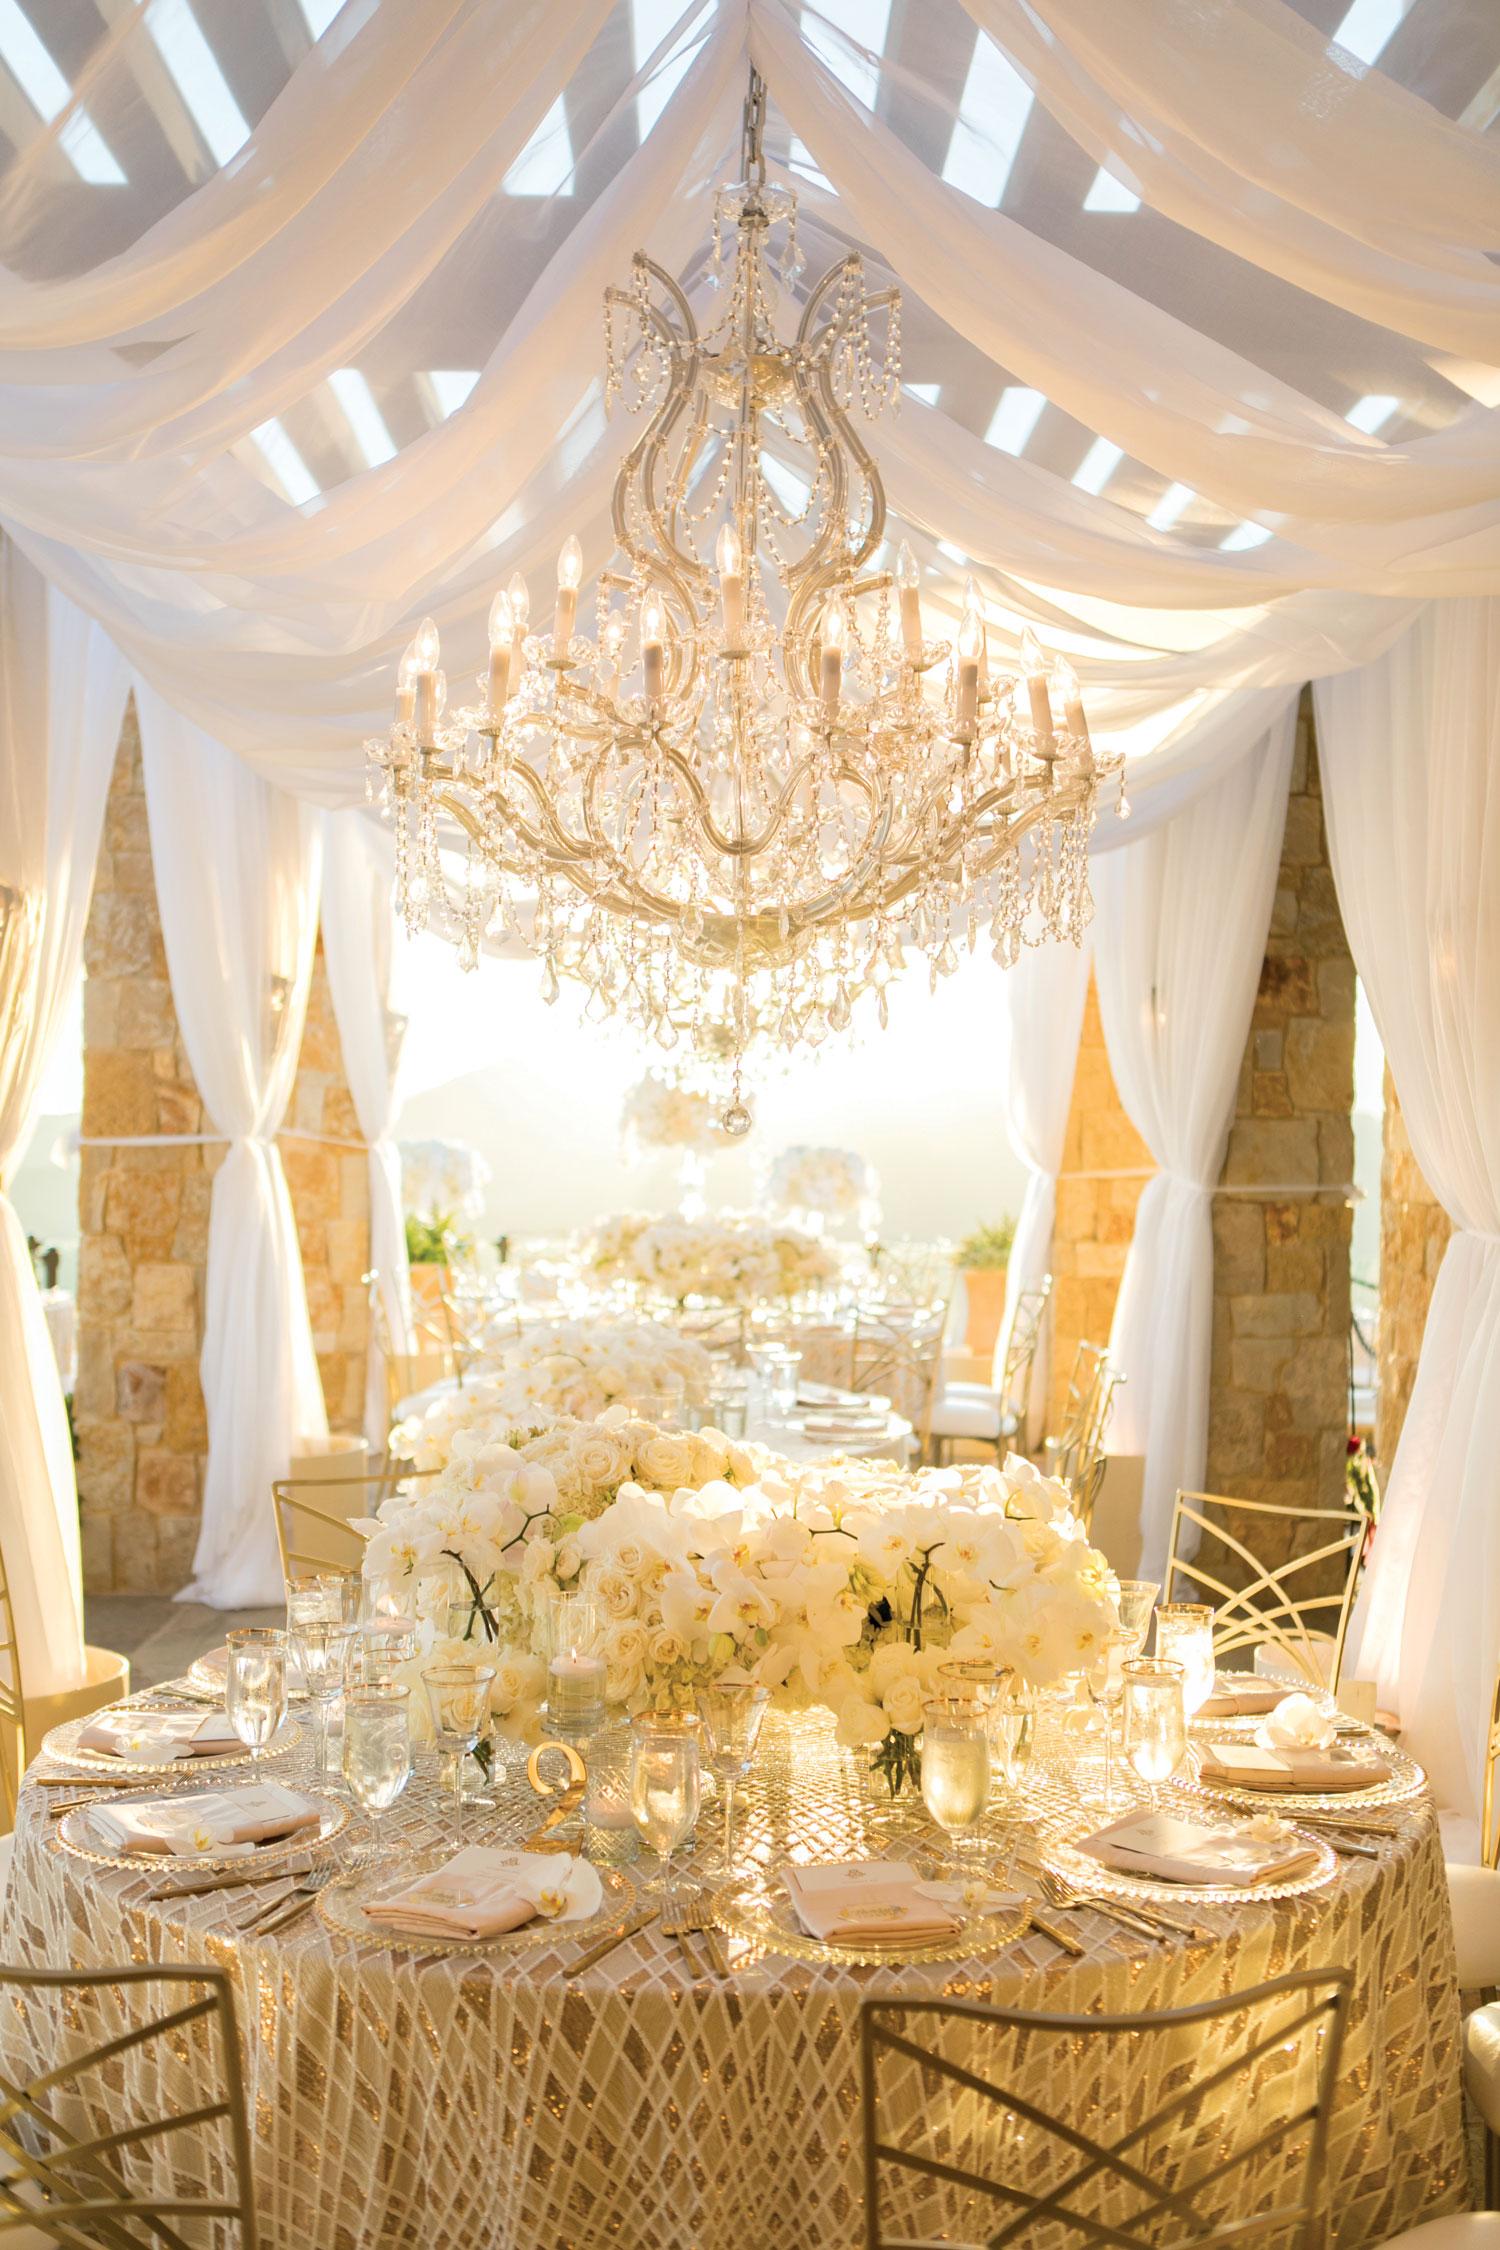 luxury real wedding reception at malibu rocky oaks designed by tessa lyn events